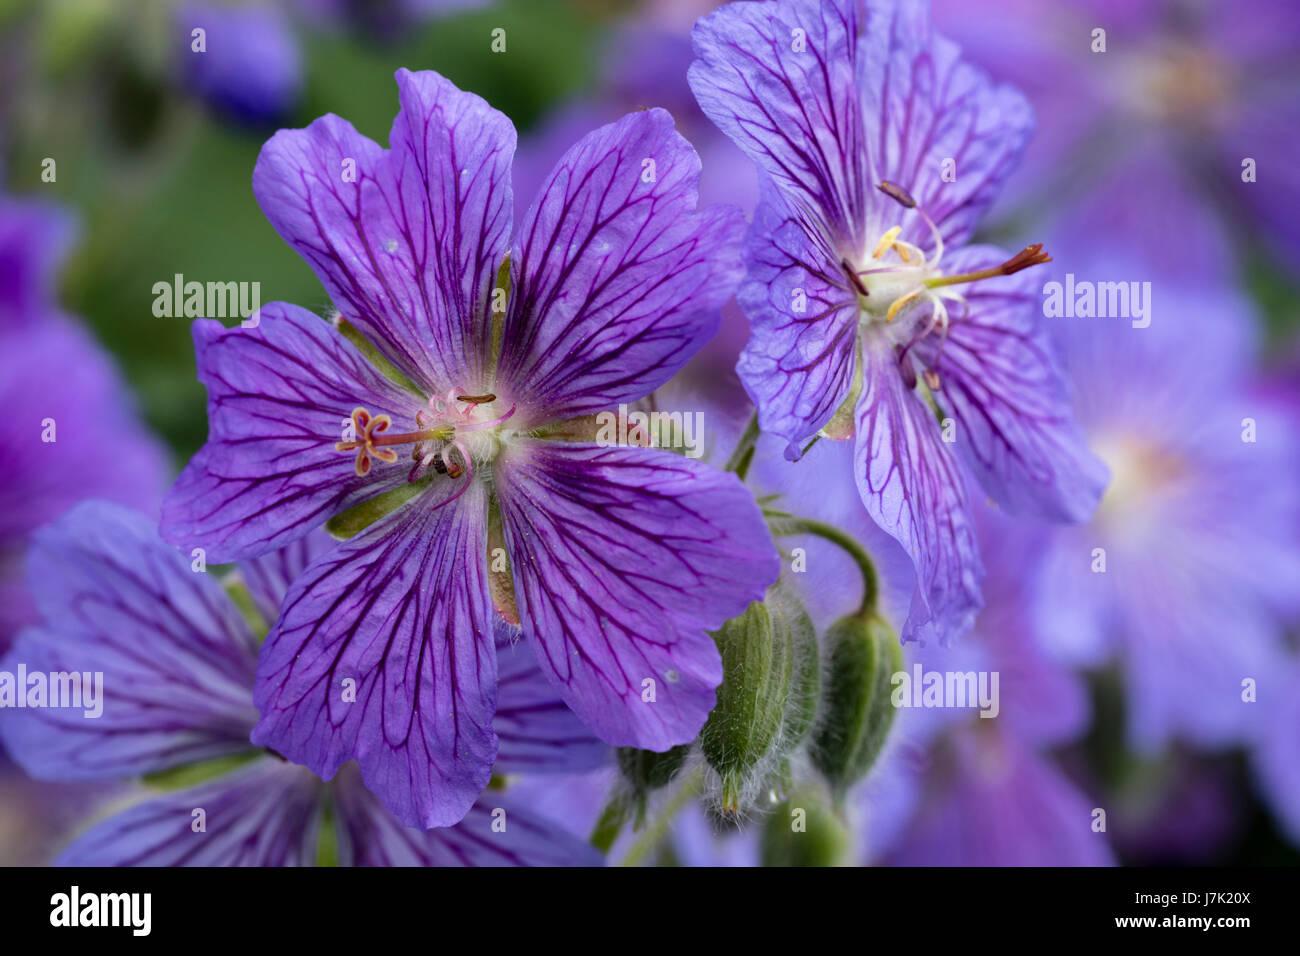 Close up of the flower of the hardy, Geranium renardii hybrid, Geranium 'Skapa Flow', showing the purple - Stock Image